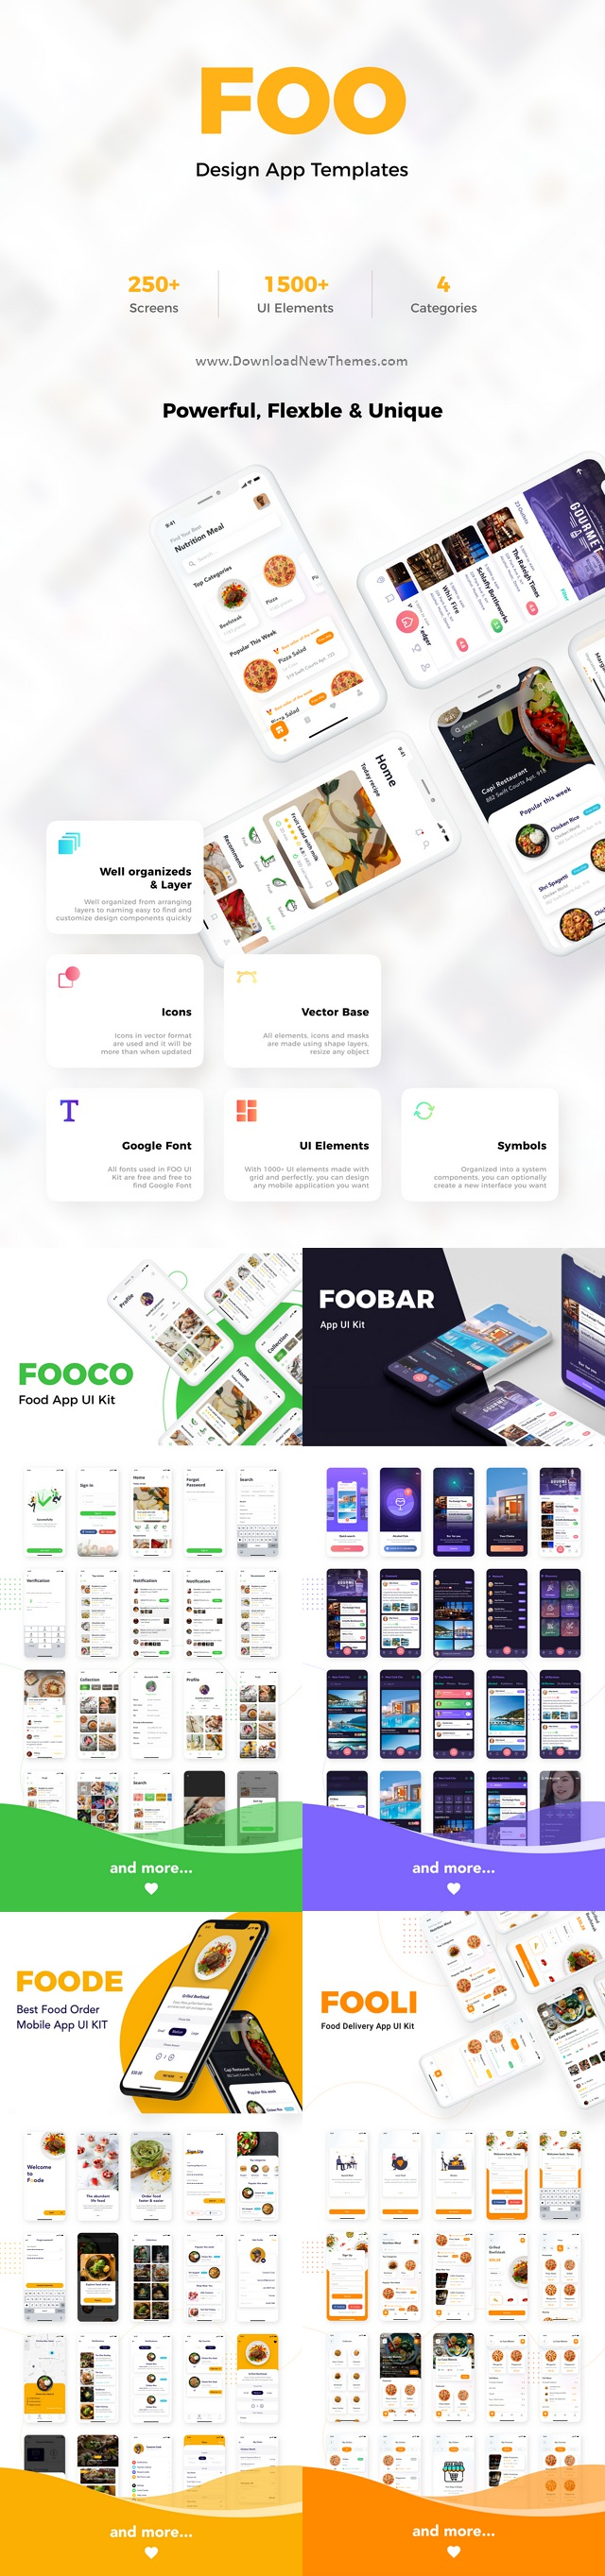 Food and Beverage Mobile App UI Kit